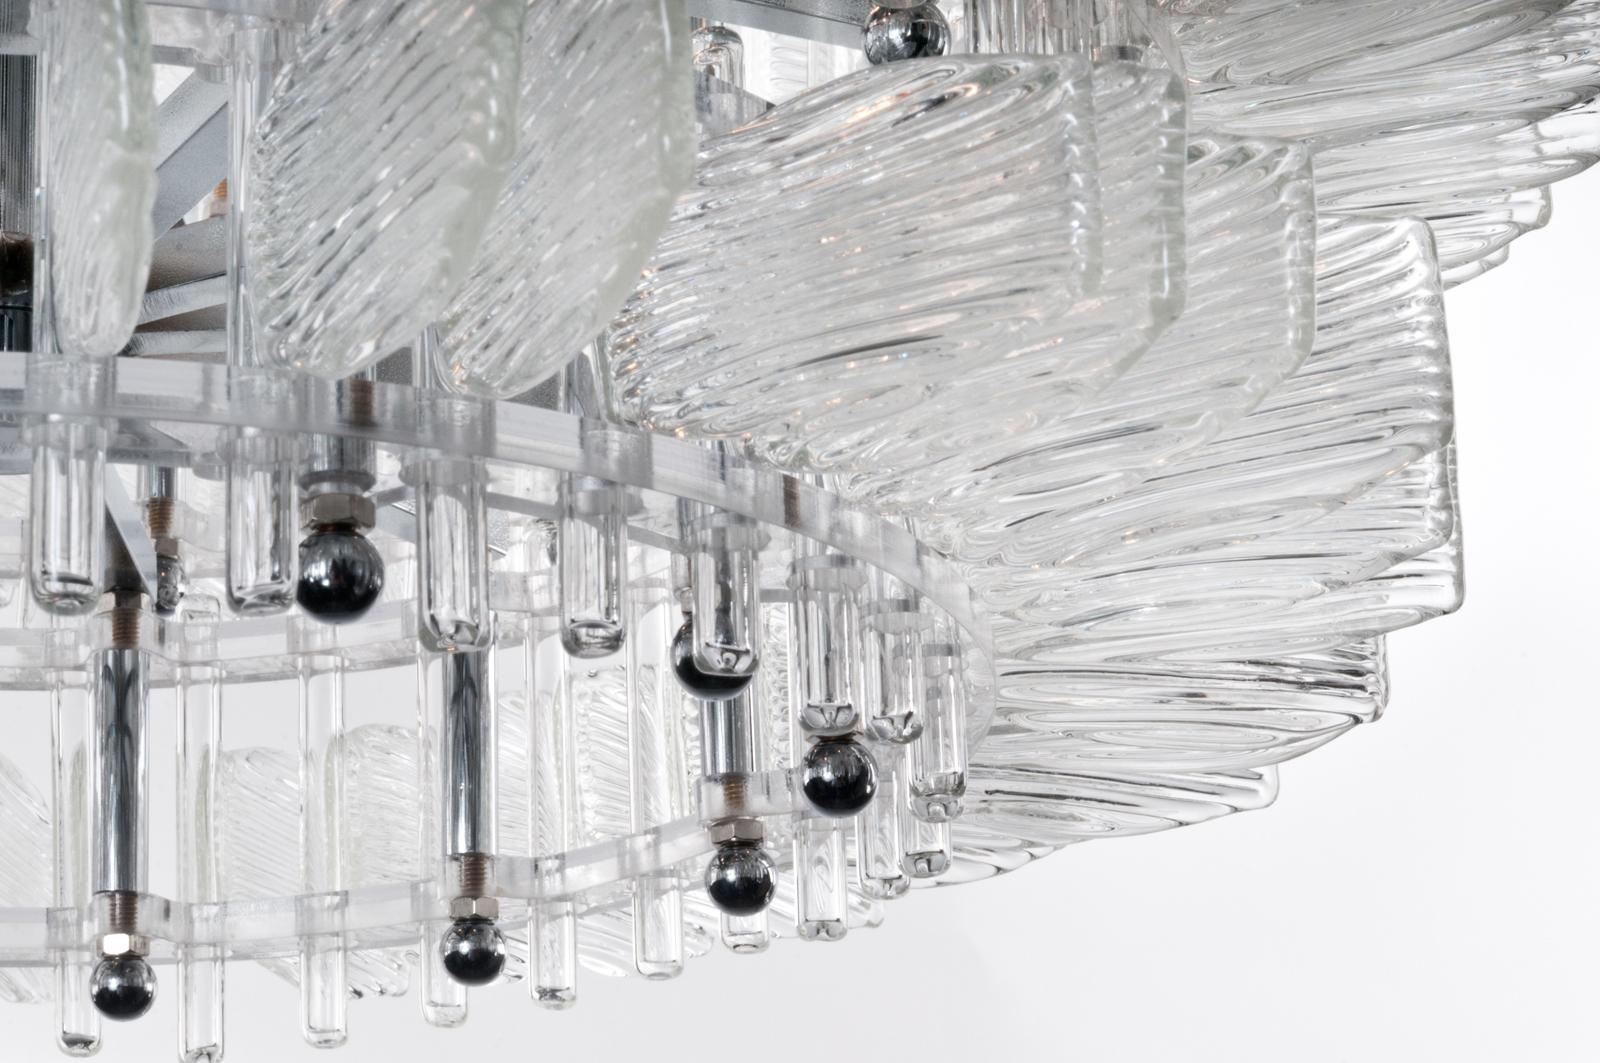 anemone-plafonnier-ceiling-veronese-tal-lancman-maurizio-galante-81.jpg